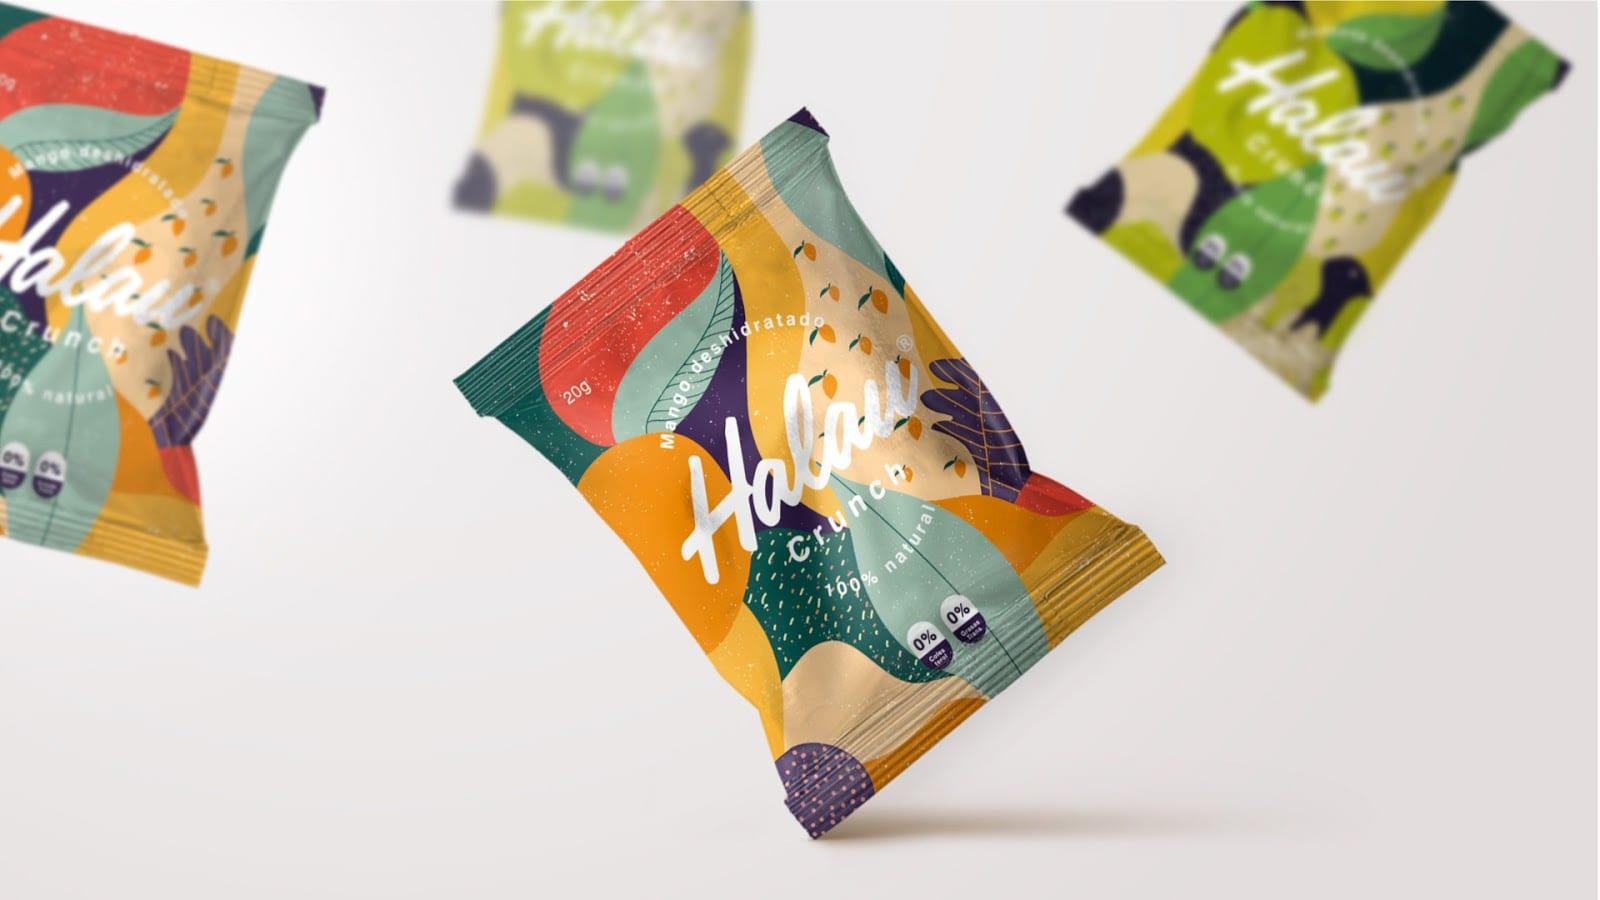 packaging halau 03 - Ach, tie obaly – Halau